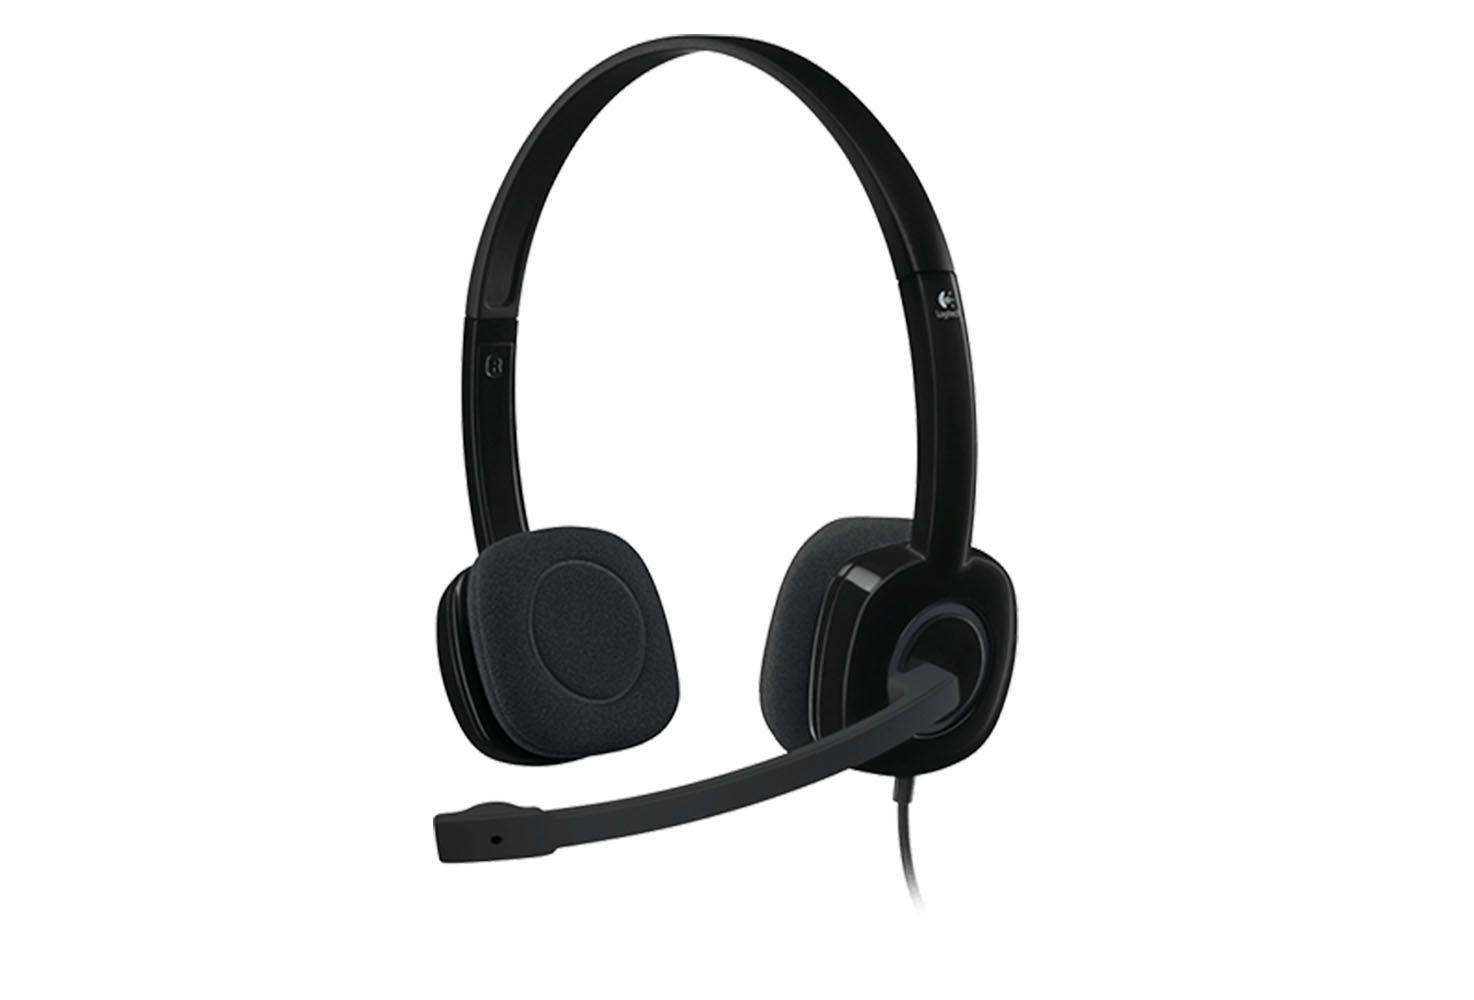 Fone Headset Stereo Logitech H151 Preto